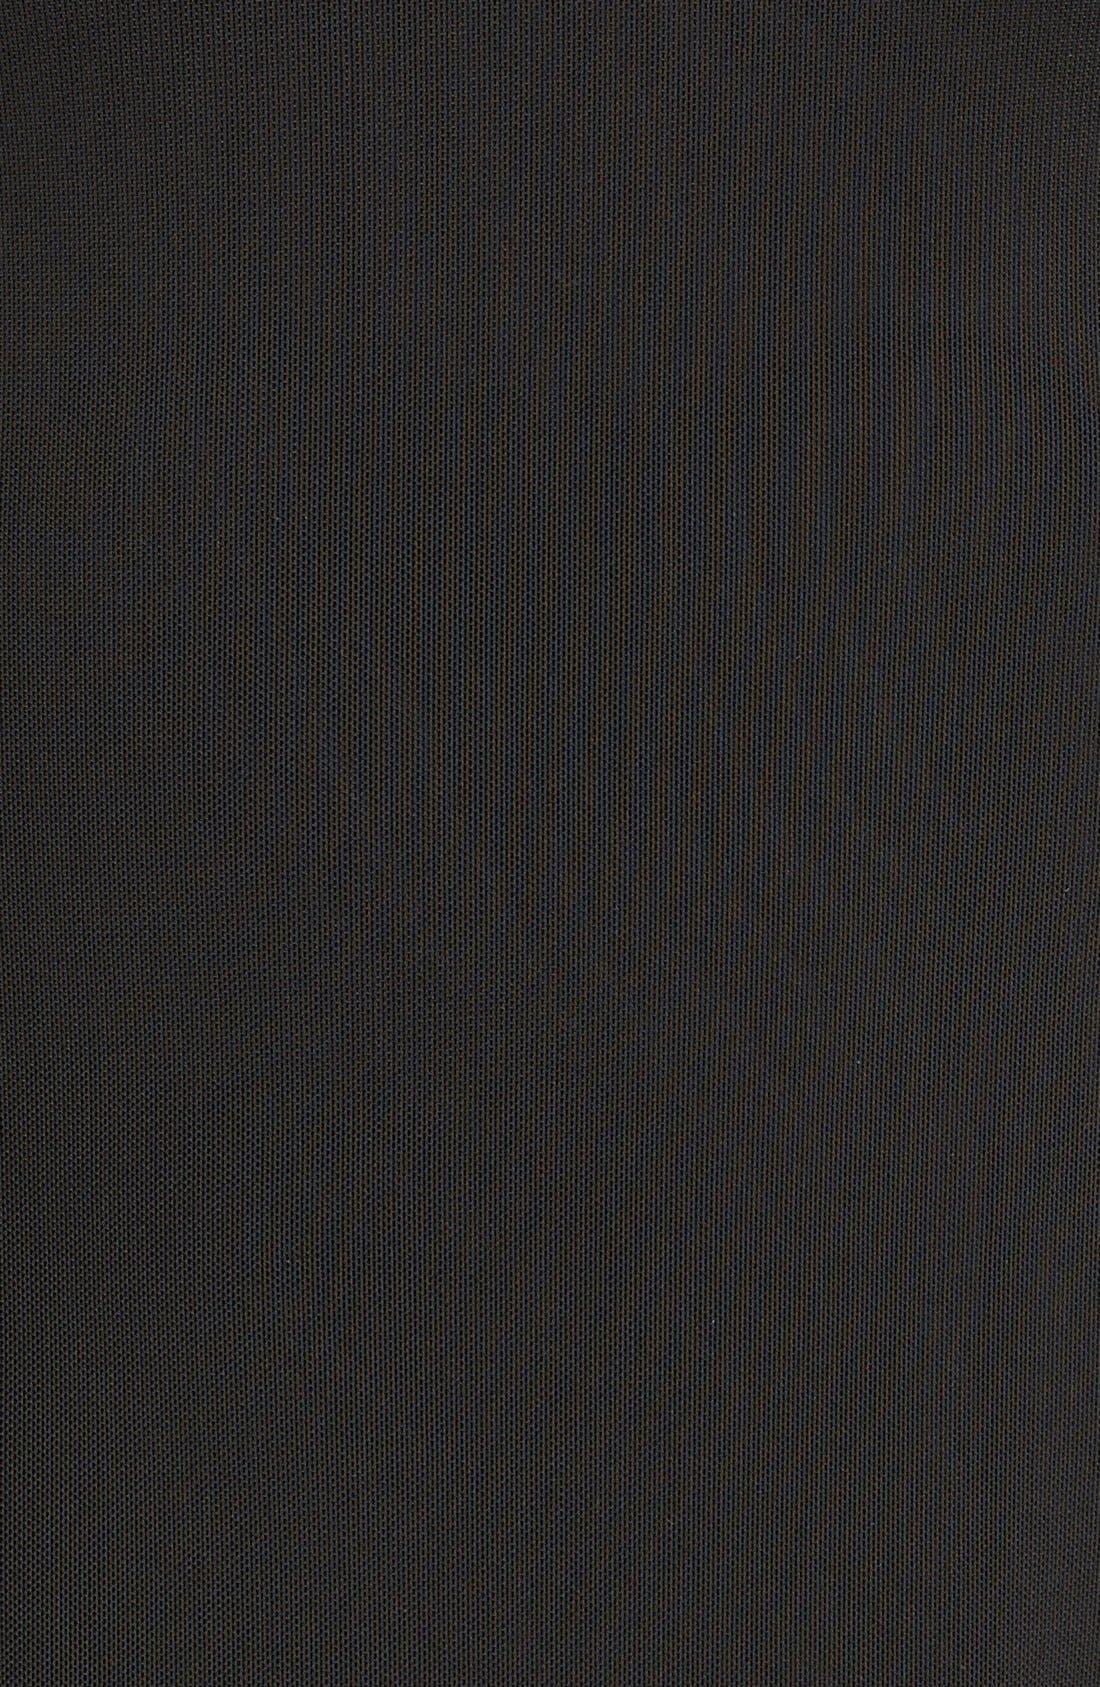 Alternate Image 3  - MINKPINK 'Here Comes the Night' Illusion Yoke Skater Dress